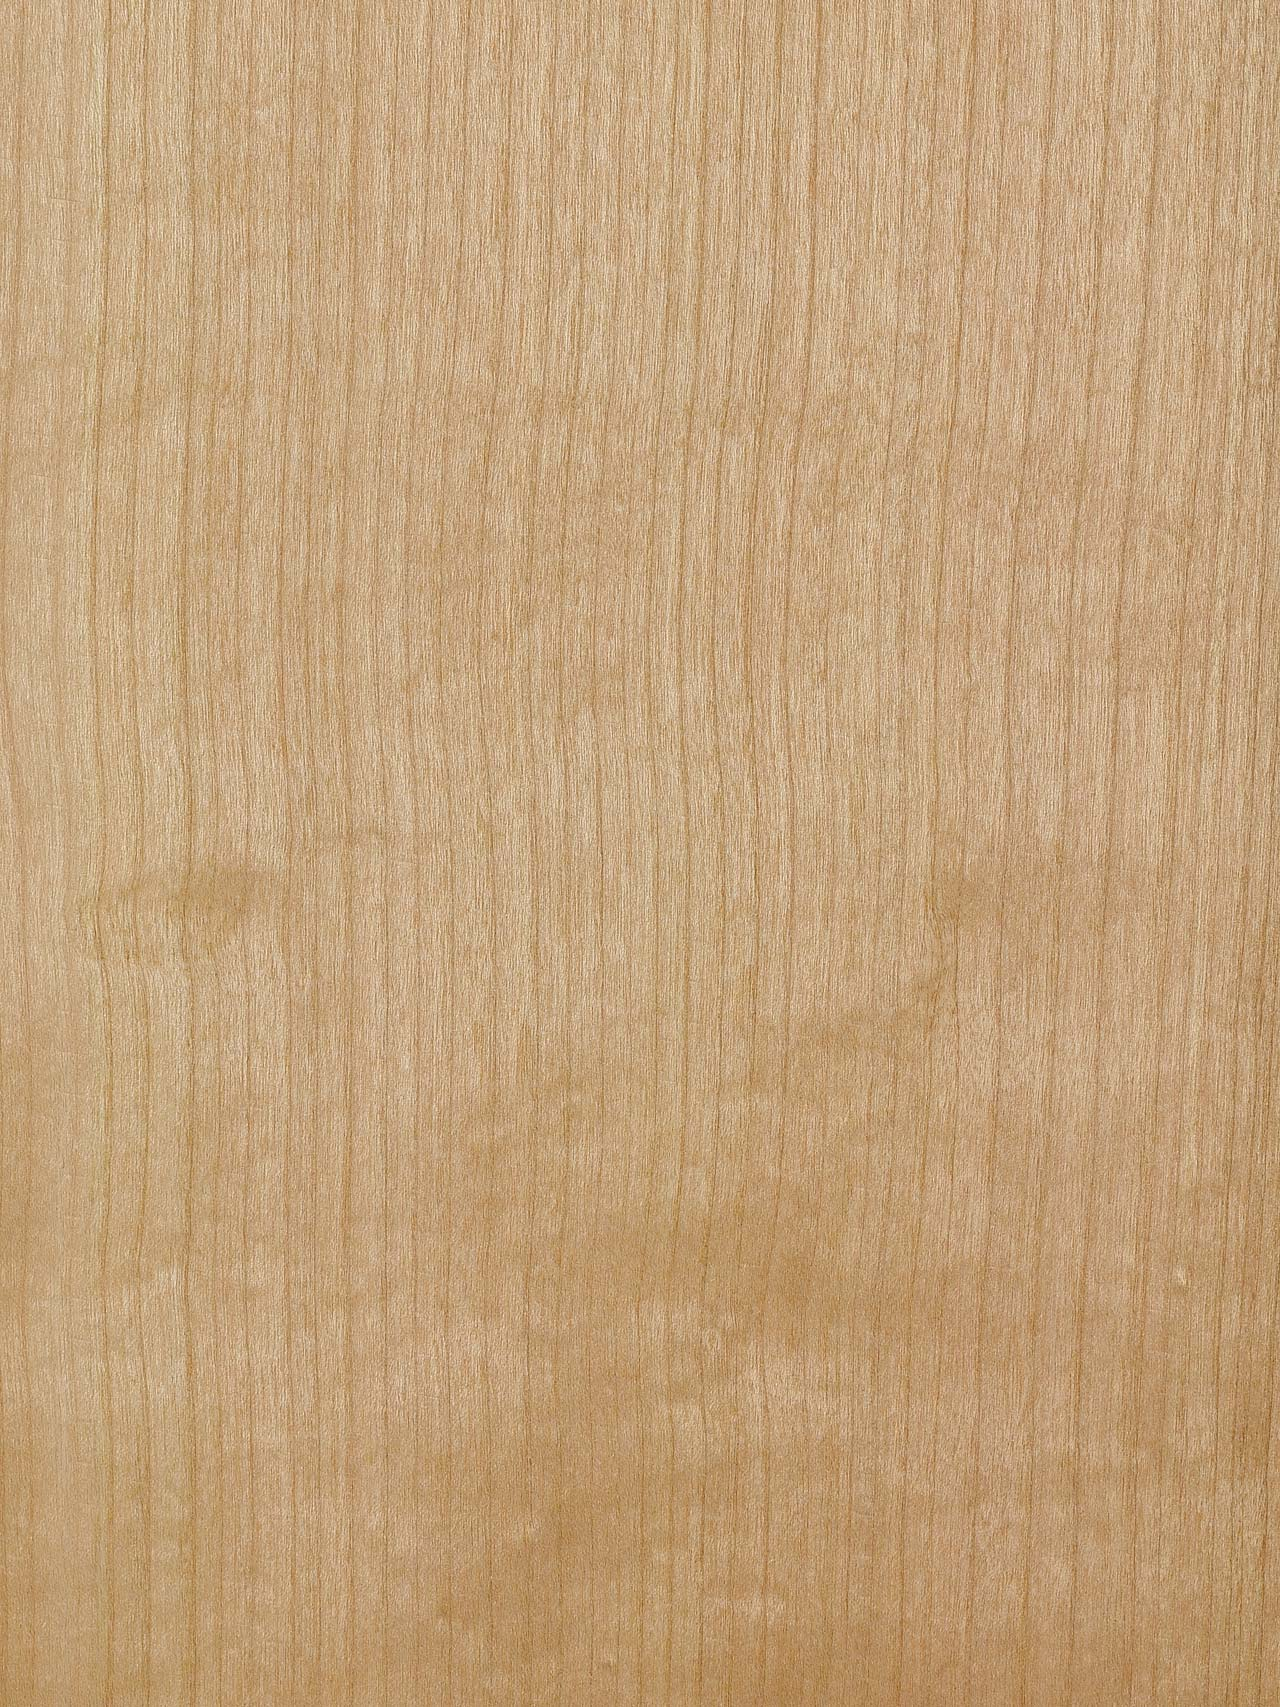 Chapa Cerezo Europeo Mallado Losán